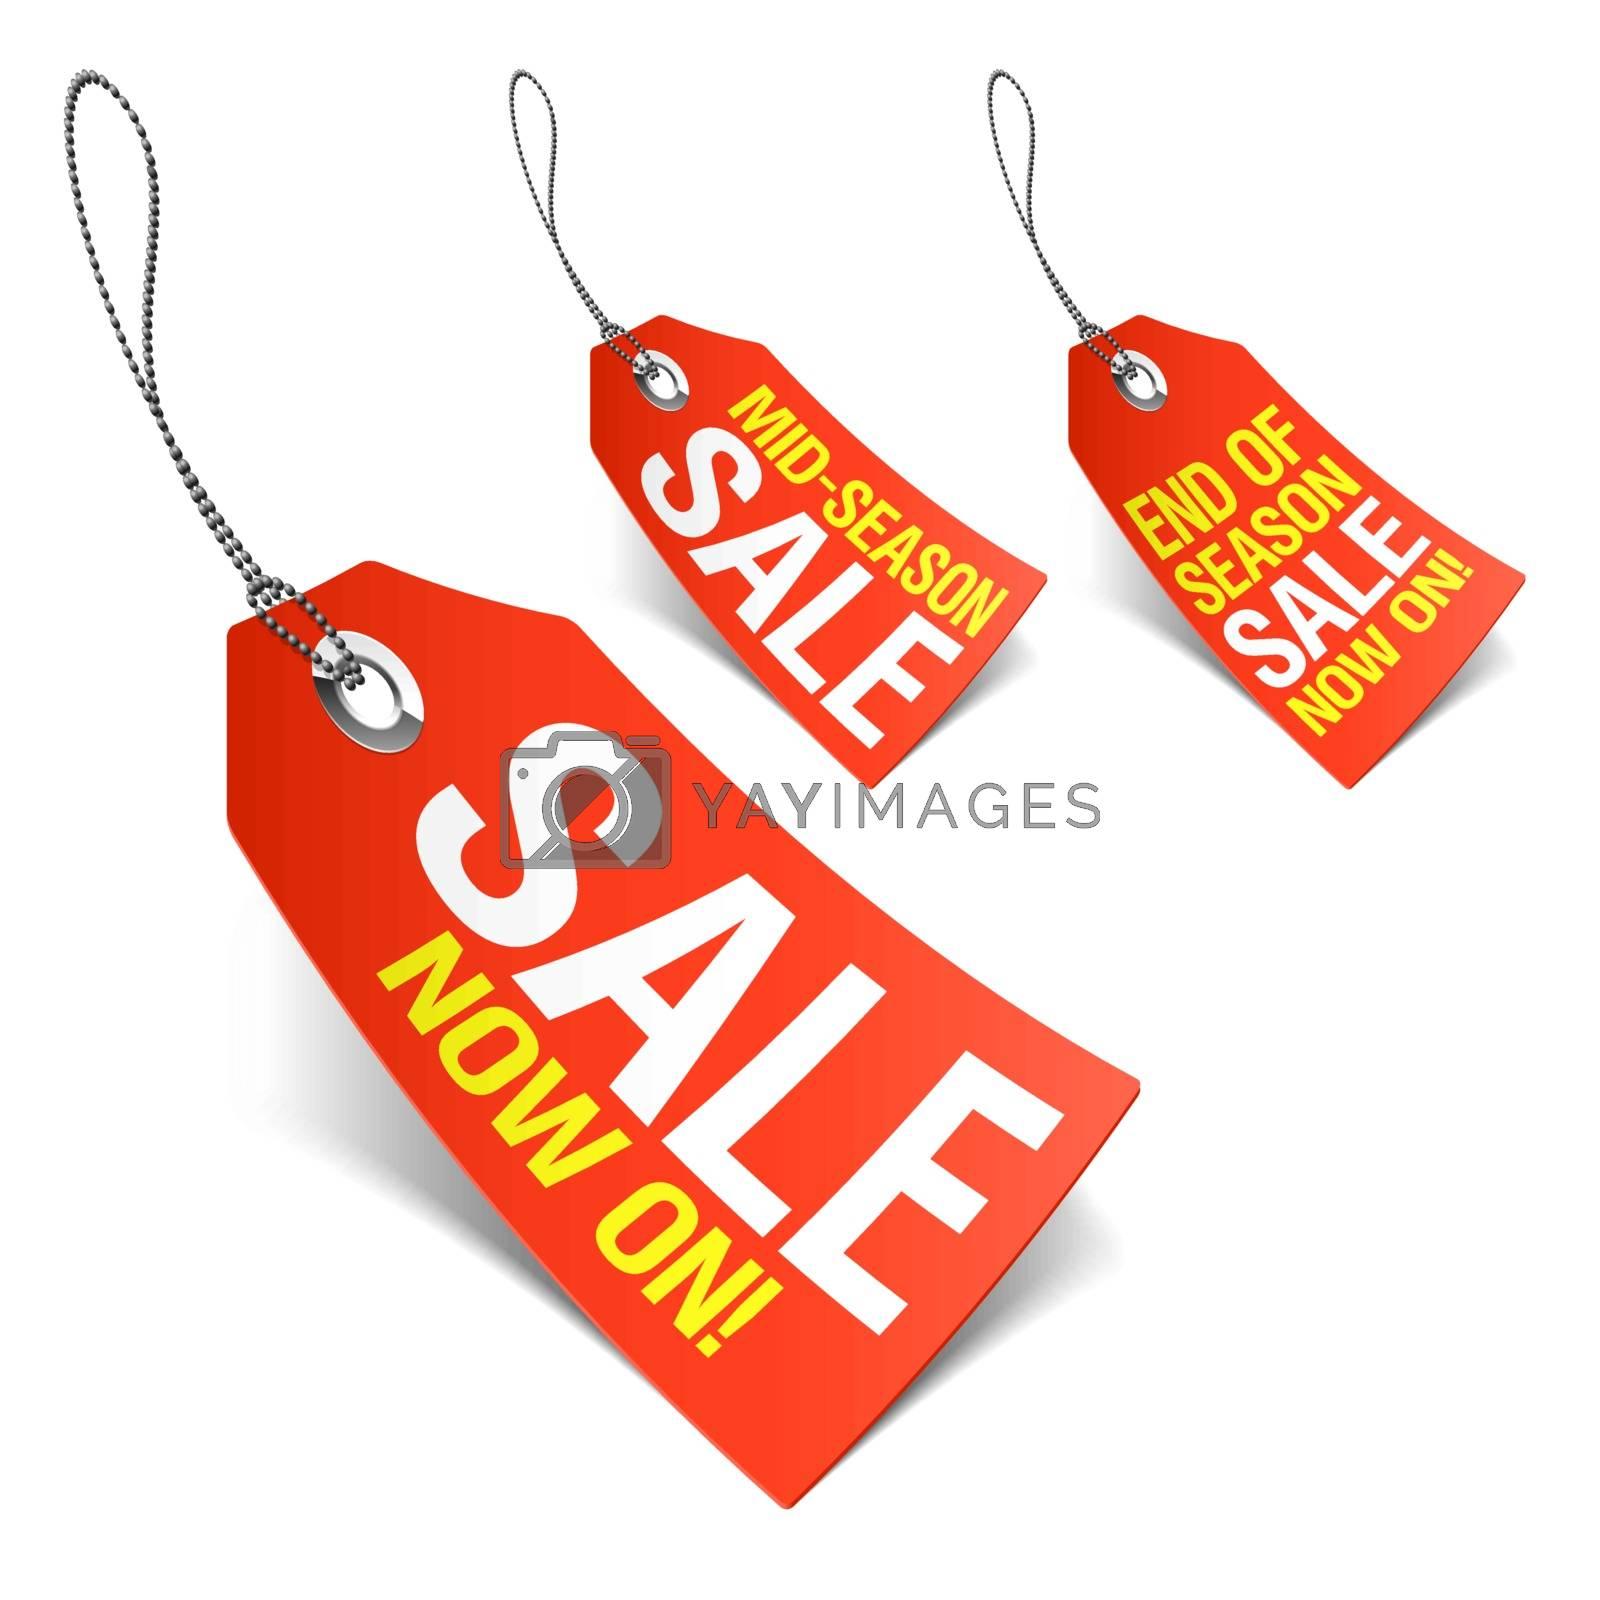 Set of big sale labels in this illustration.